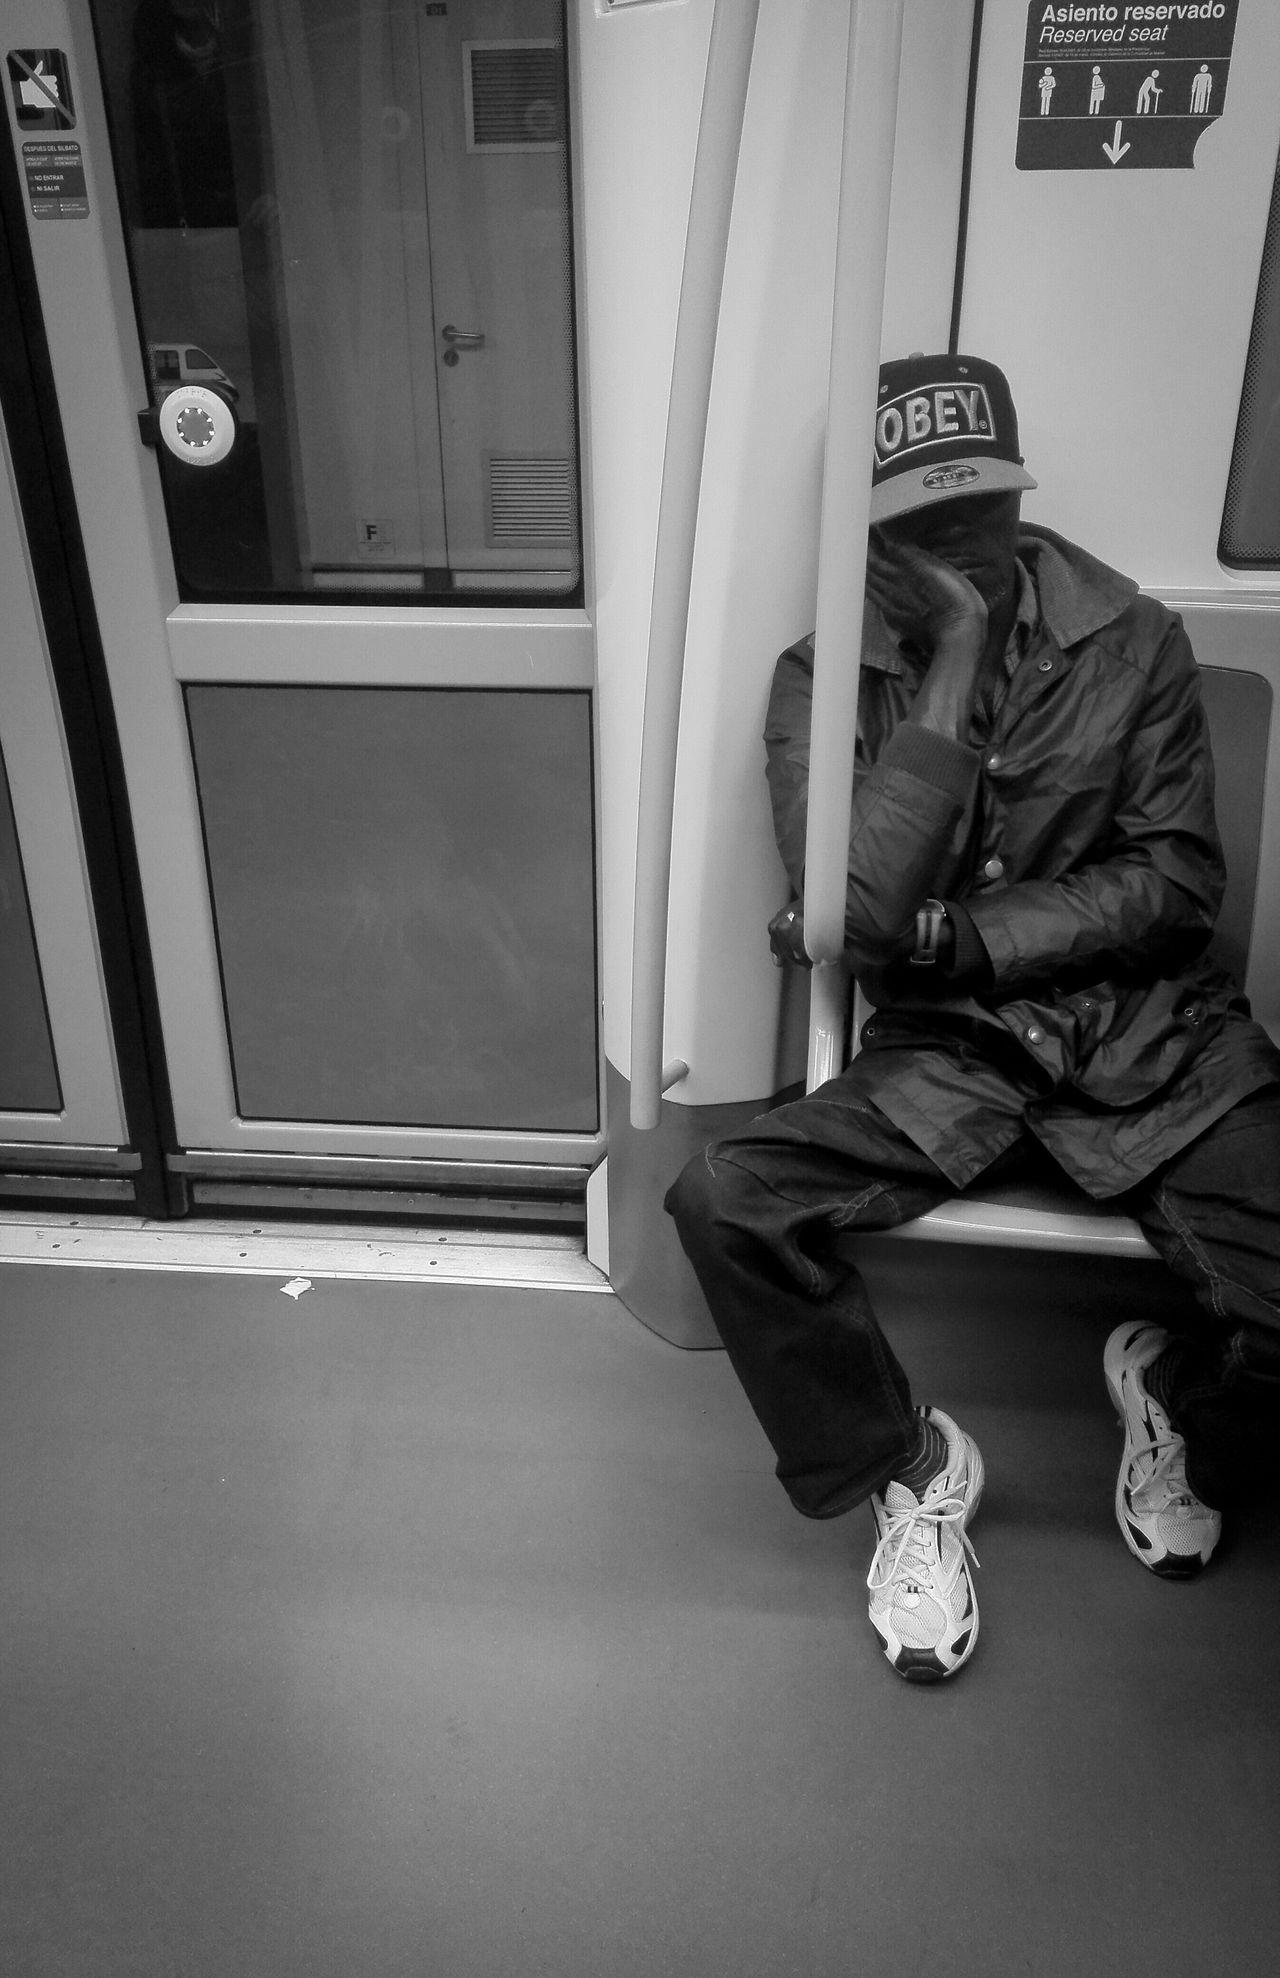 OBEY Underground Undergroundphotography Bnw Blackandwhite Blackman Seating Blanco Y Negro Bnw Photography Bnw_collection Bnw_captures Bnw_society Bnw_life